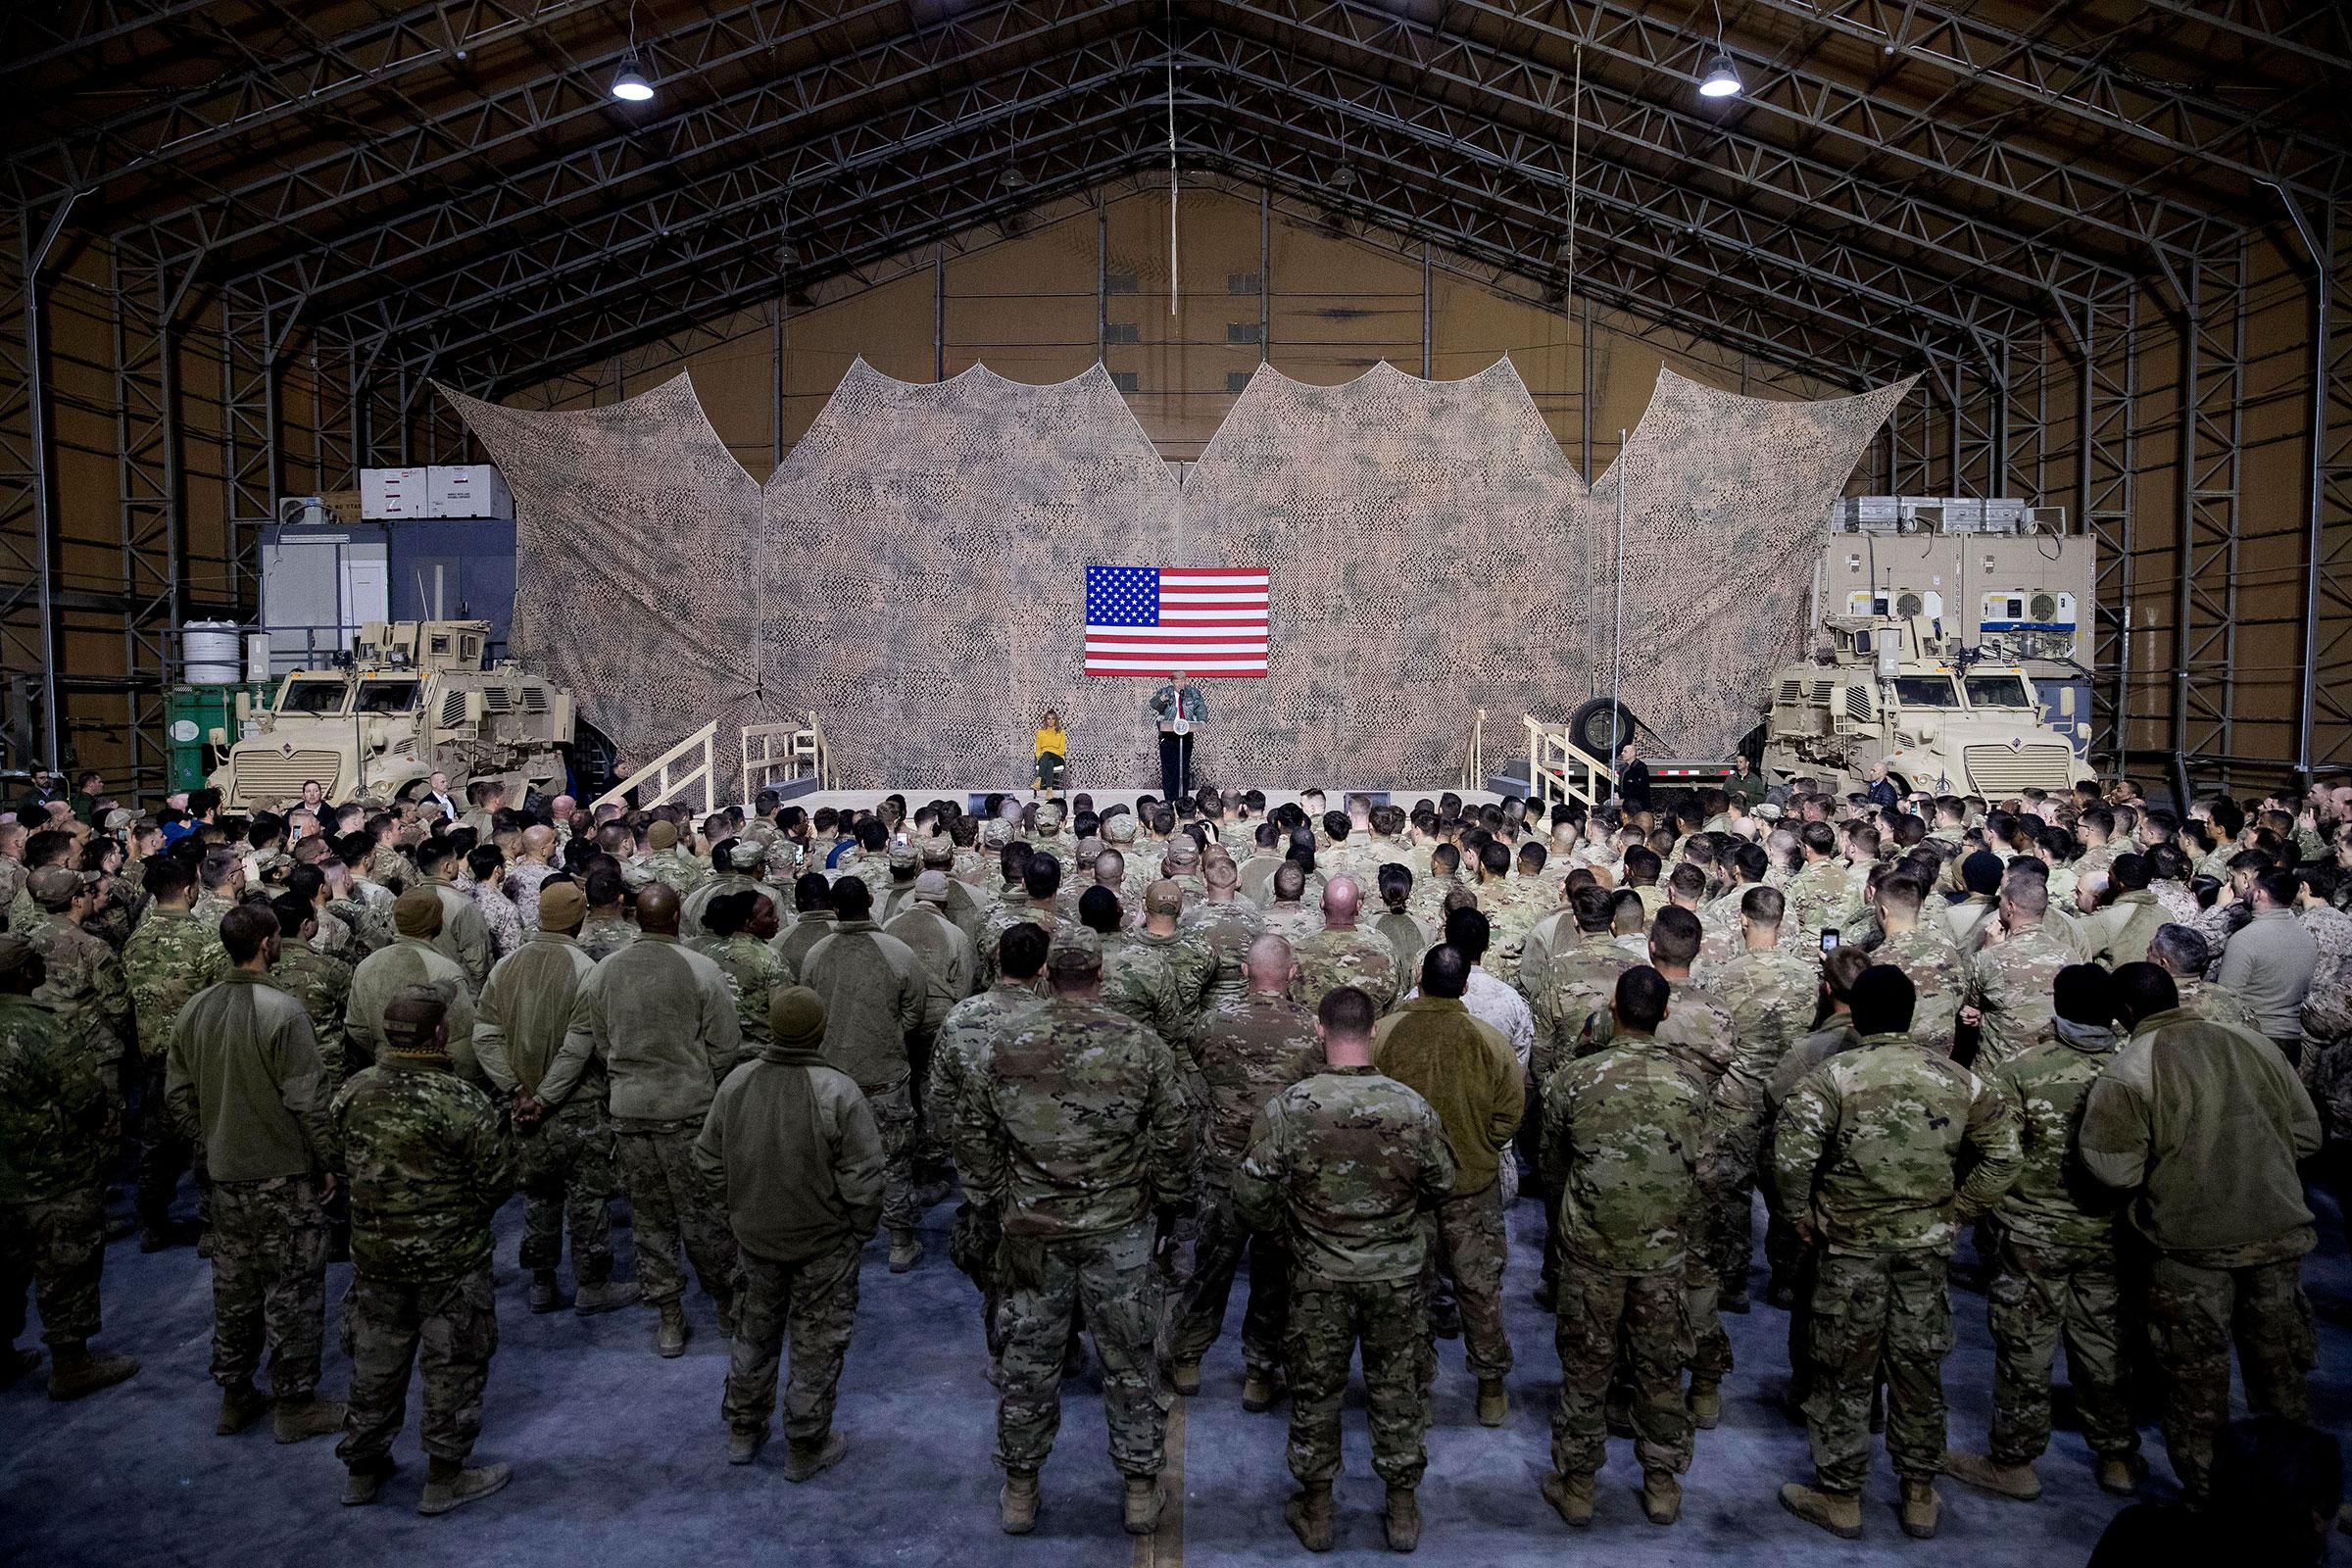 President Trump speaks at a rally in a hangar at Al Asad Air Base, Iraq, on Dec.26, 2018